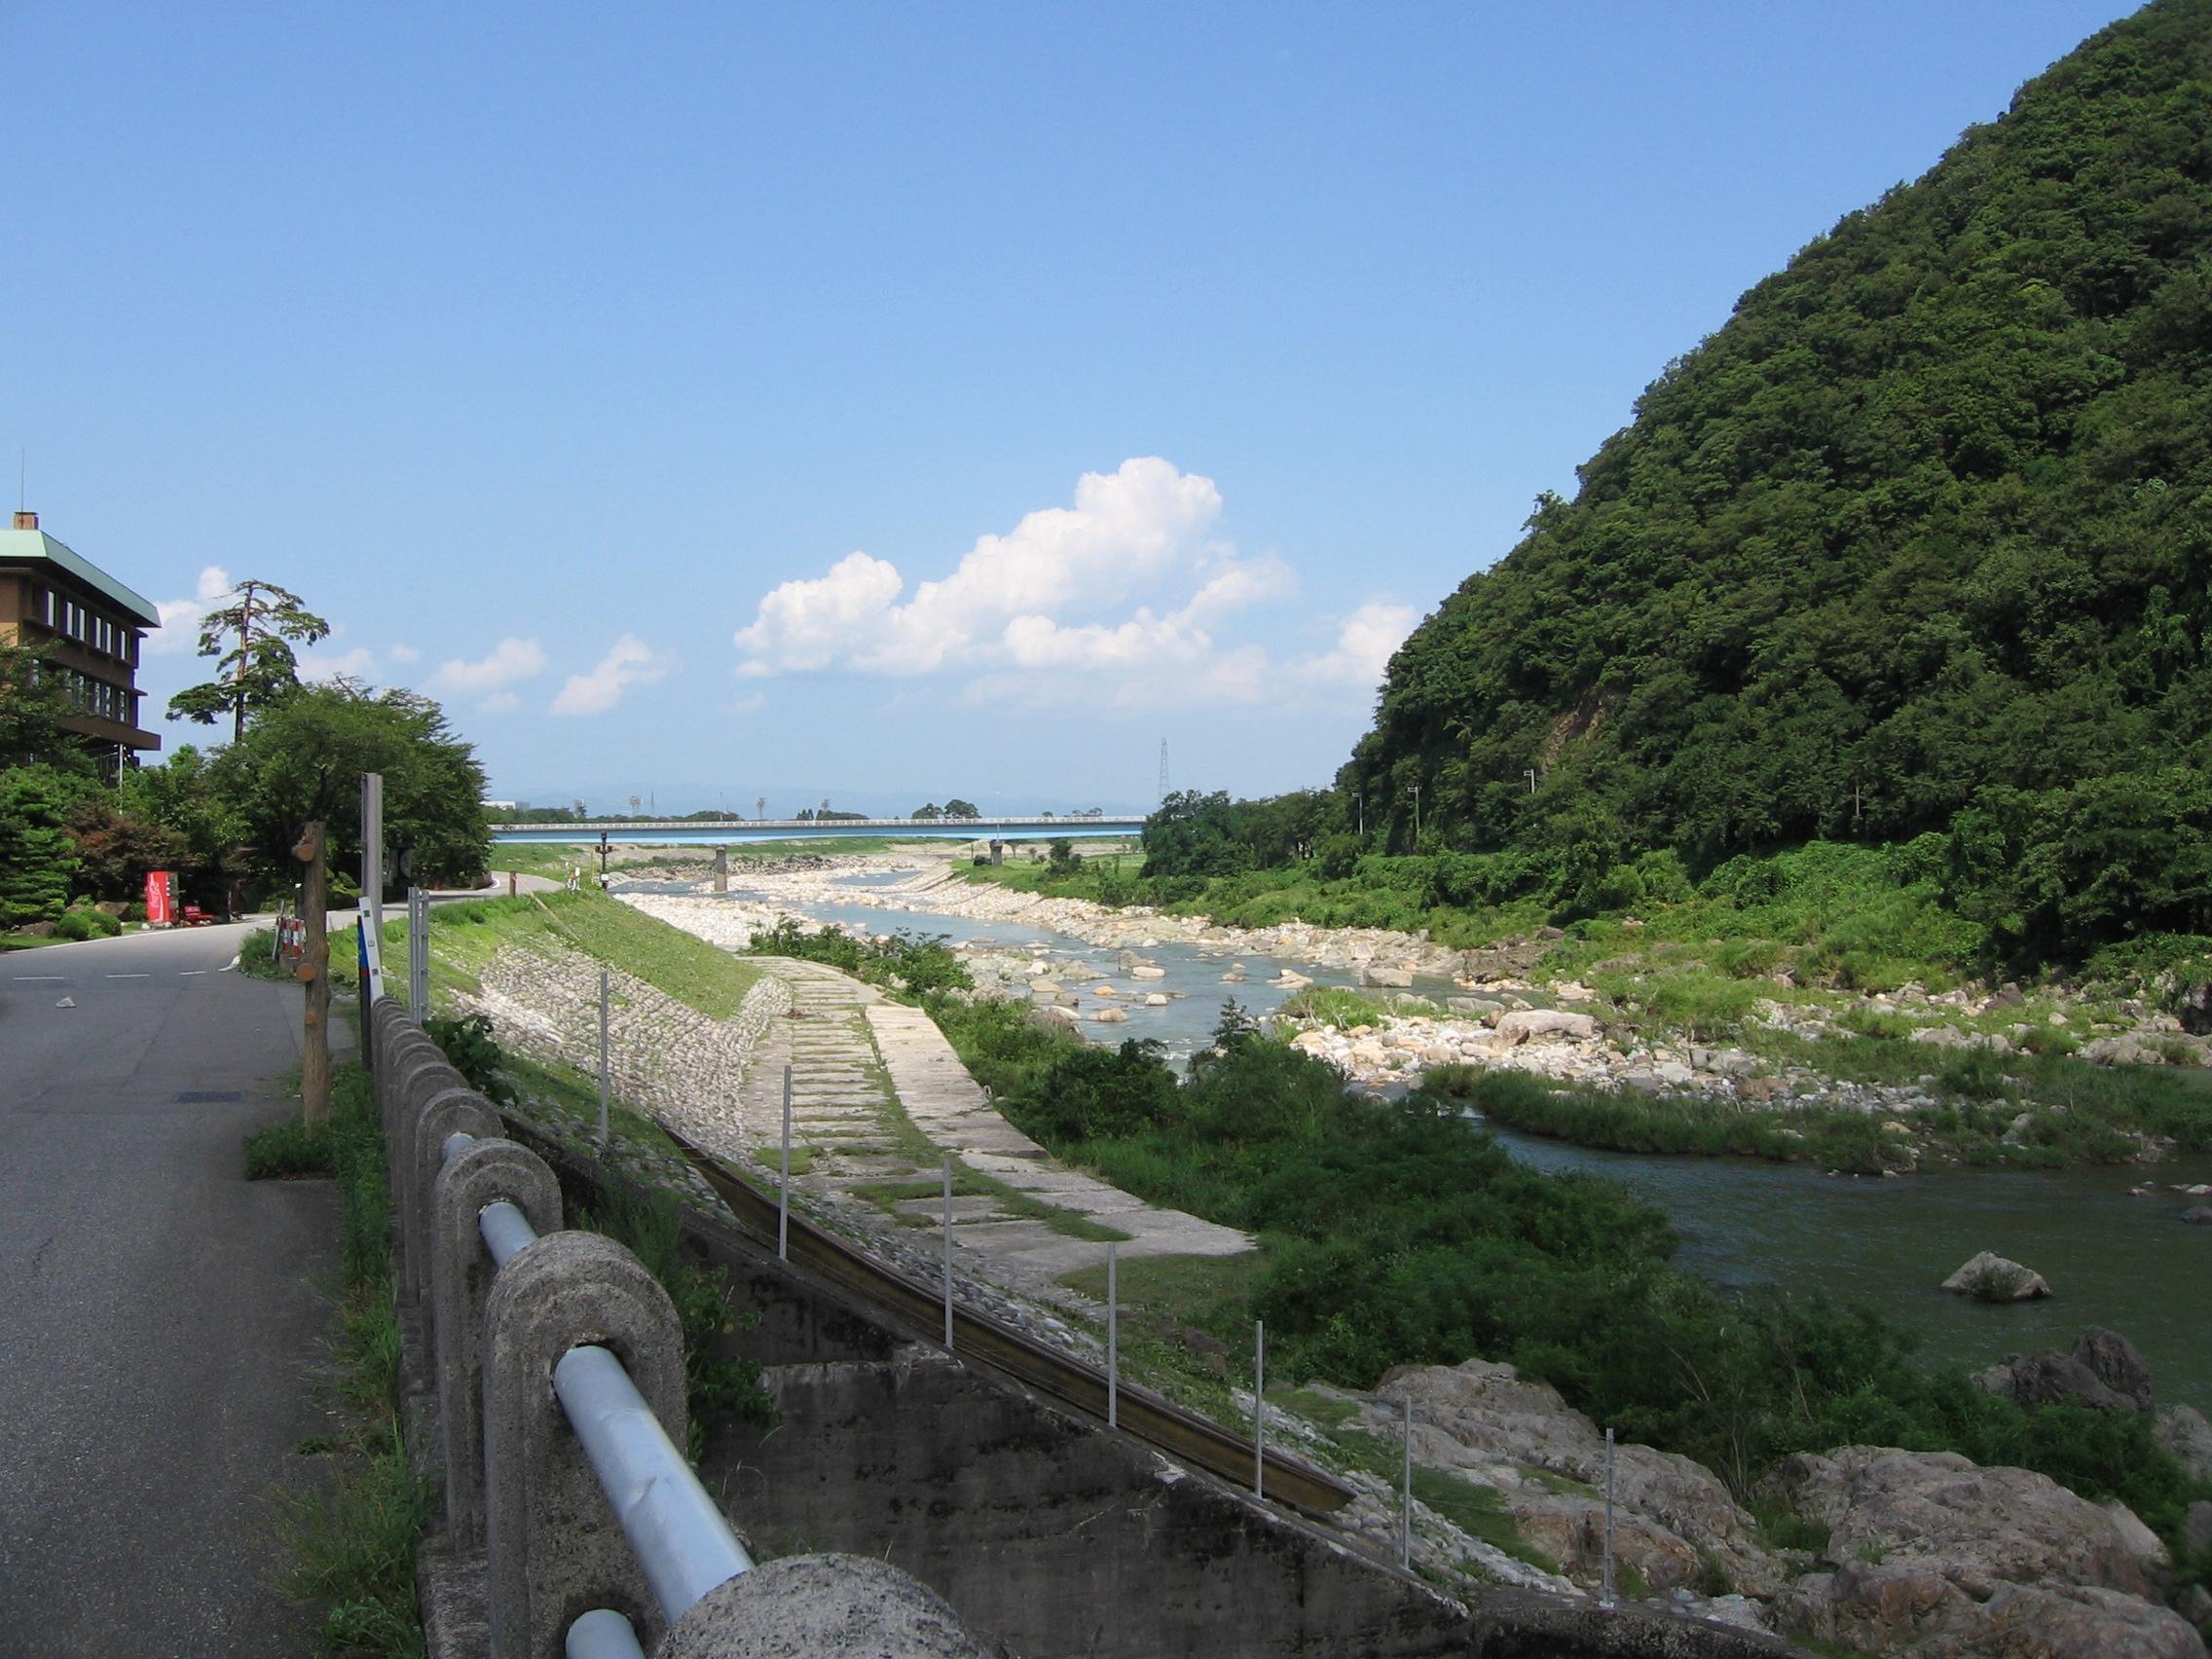 Toyama Japan  city pictures gallery : Sho River Gifu & Toyama, Japan 1 Wikipedia, the free ...